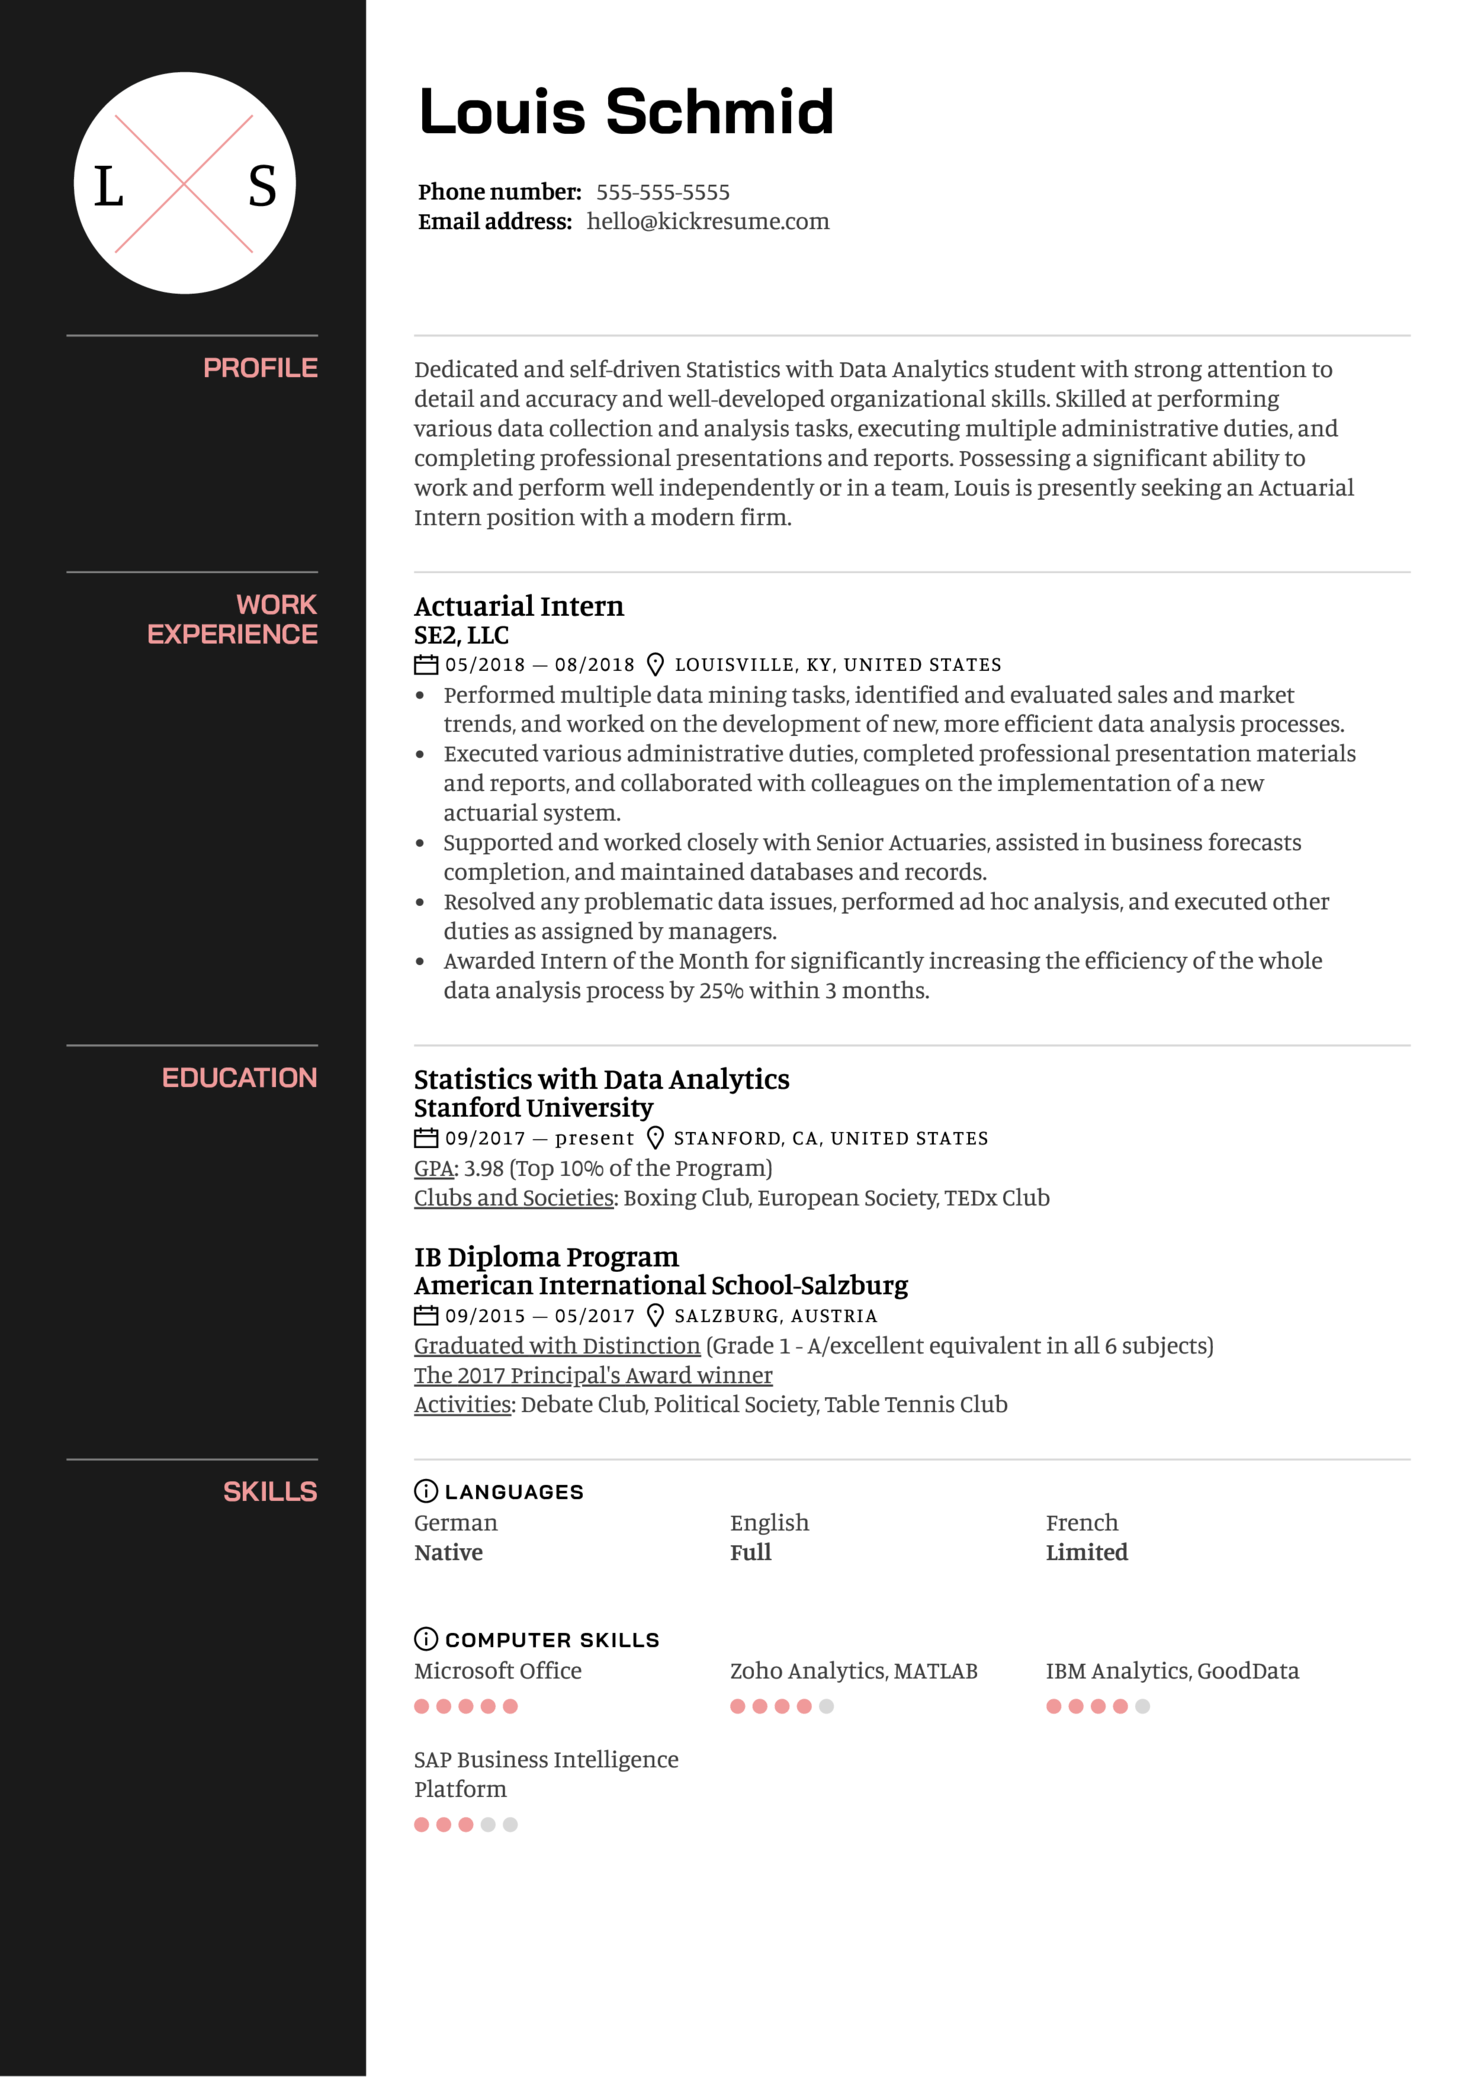 Actuarial Intern Resume Sample (Teil 1)